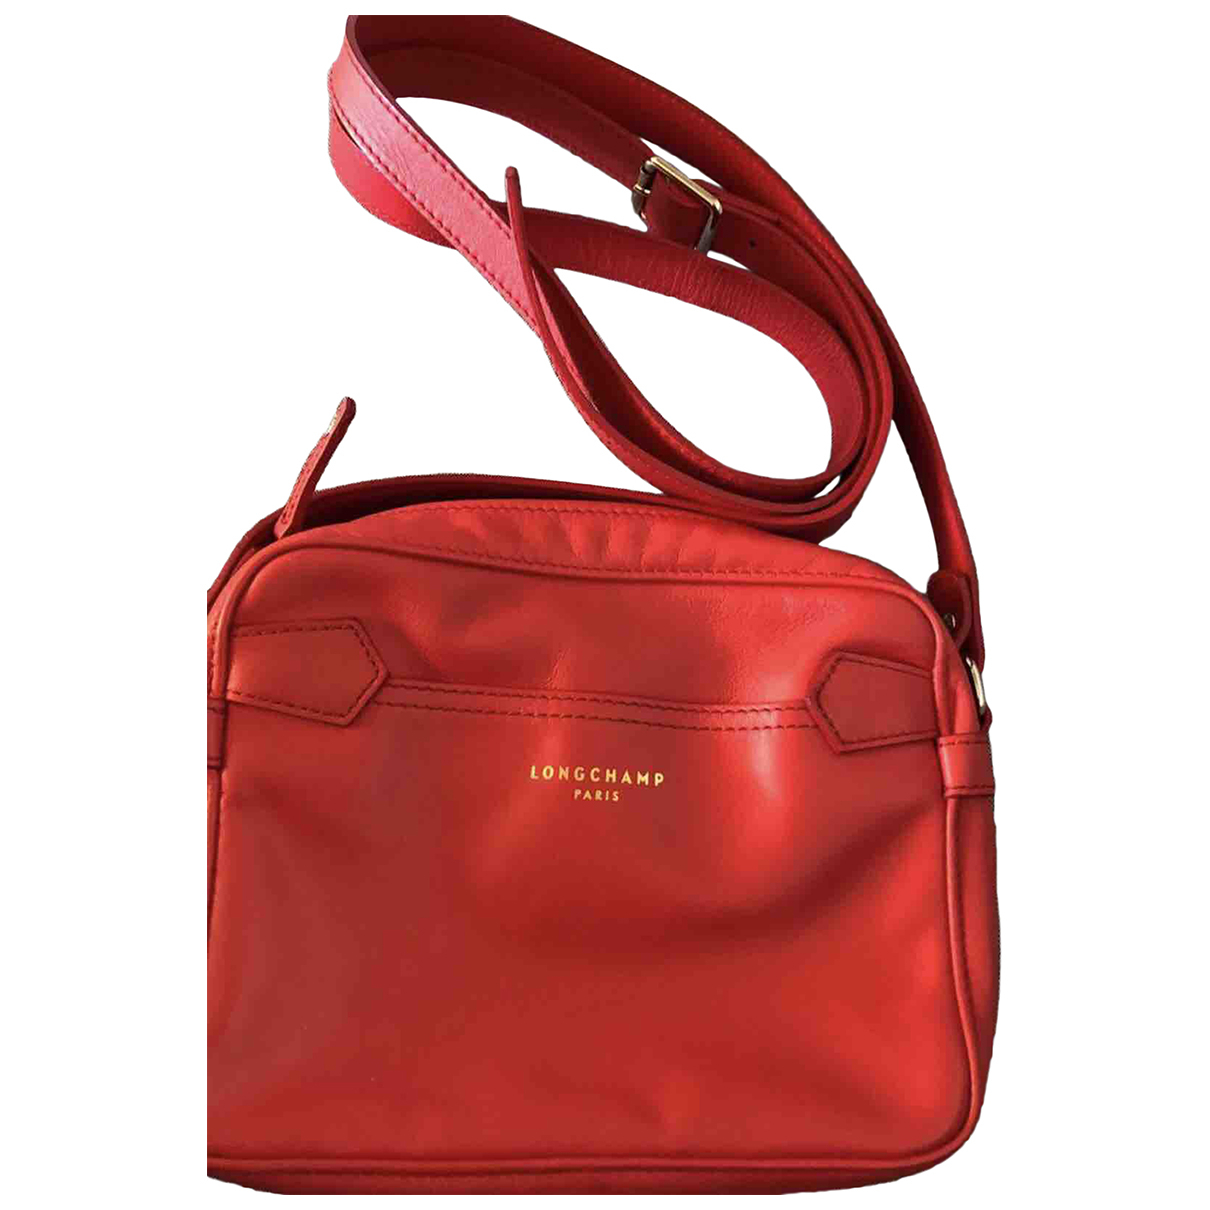 Longchamp \N Handtasche in  Rot Leder